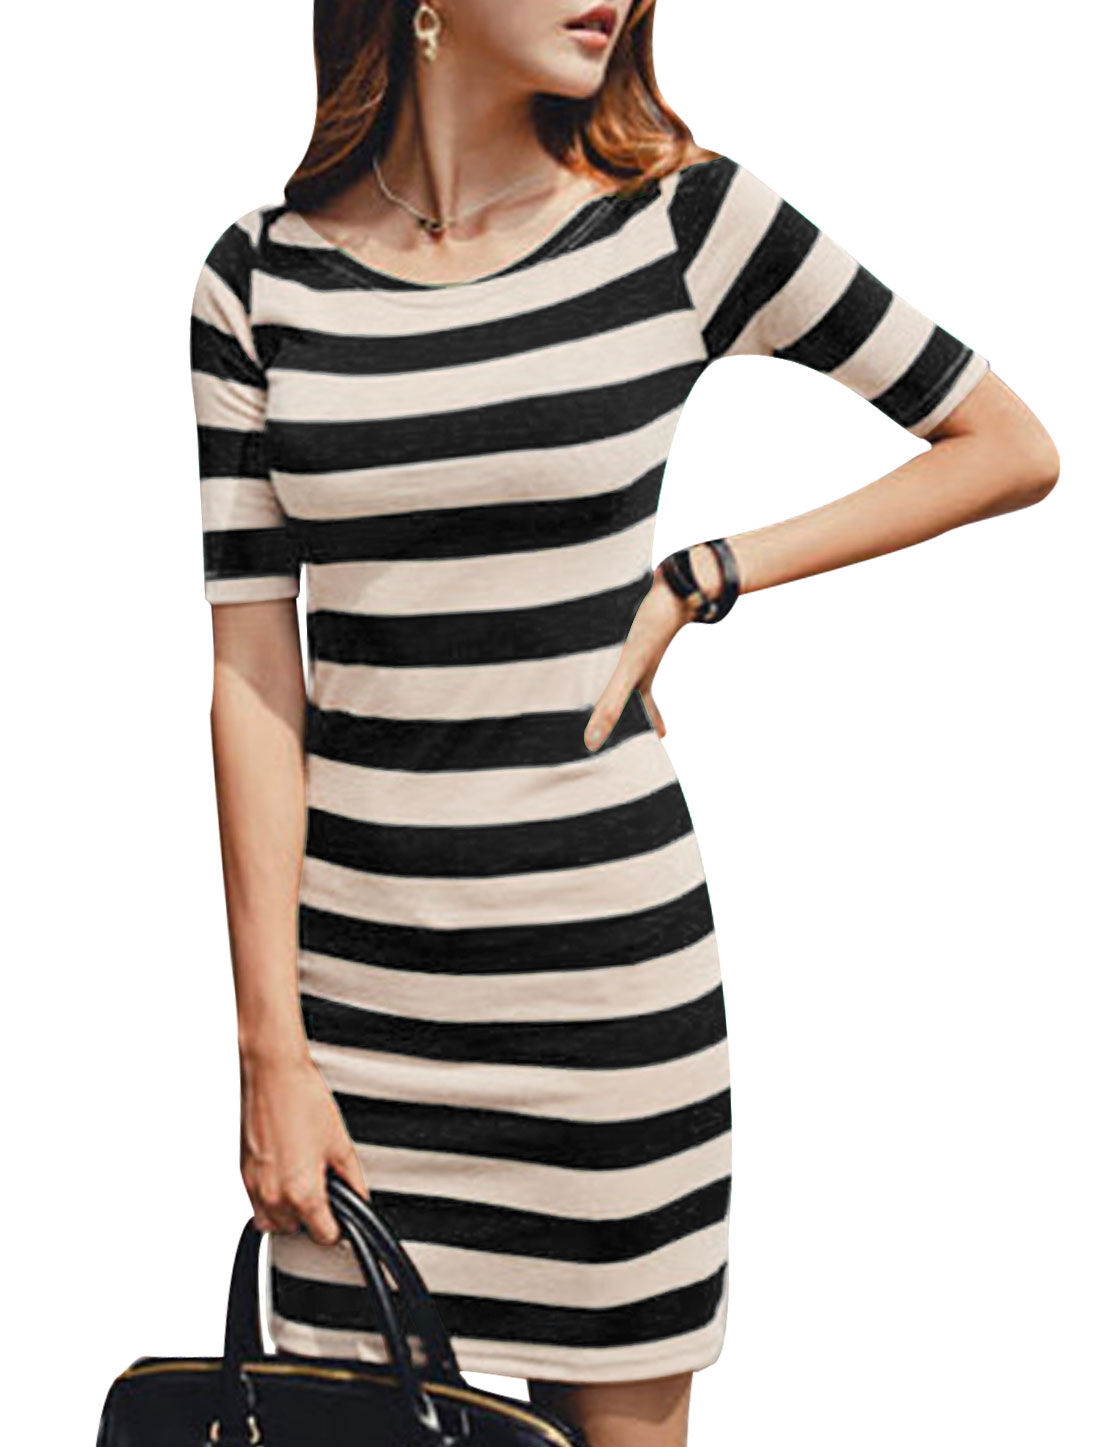 Lady Round Neck Short Sleeve Stripes Colorblock Dress Black M